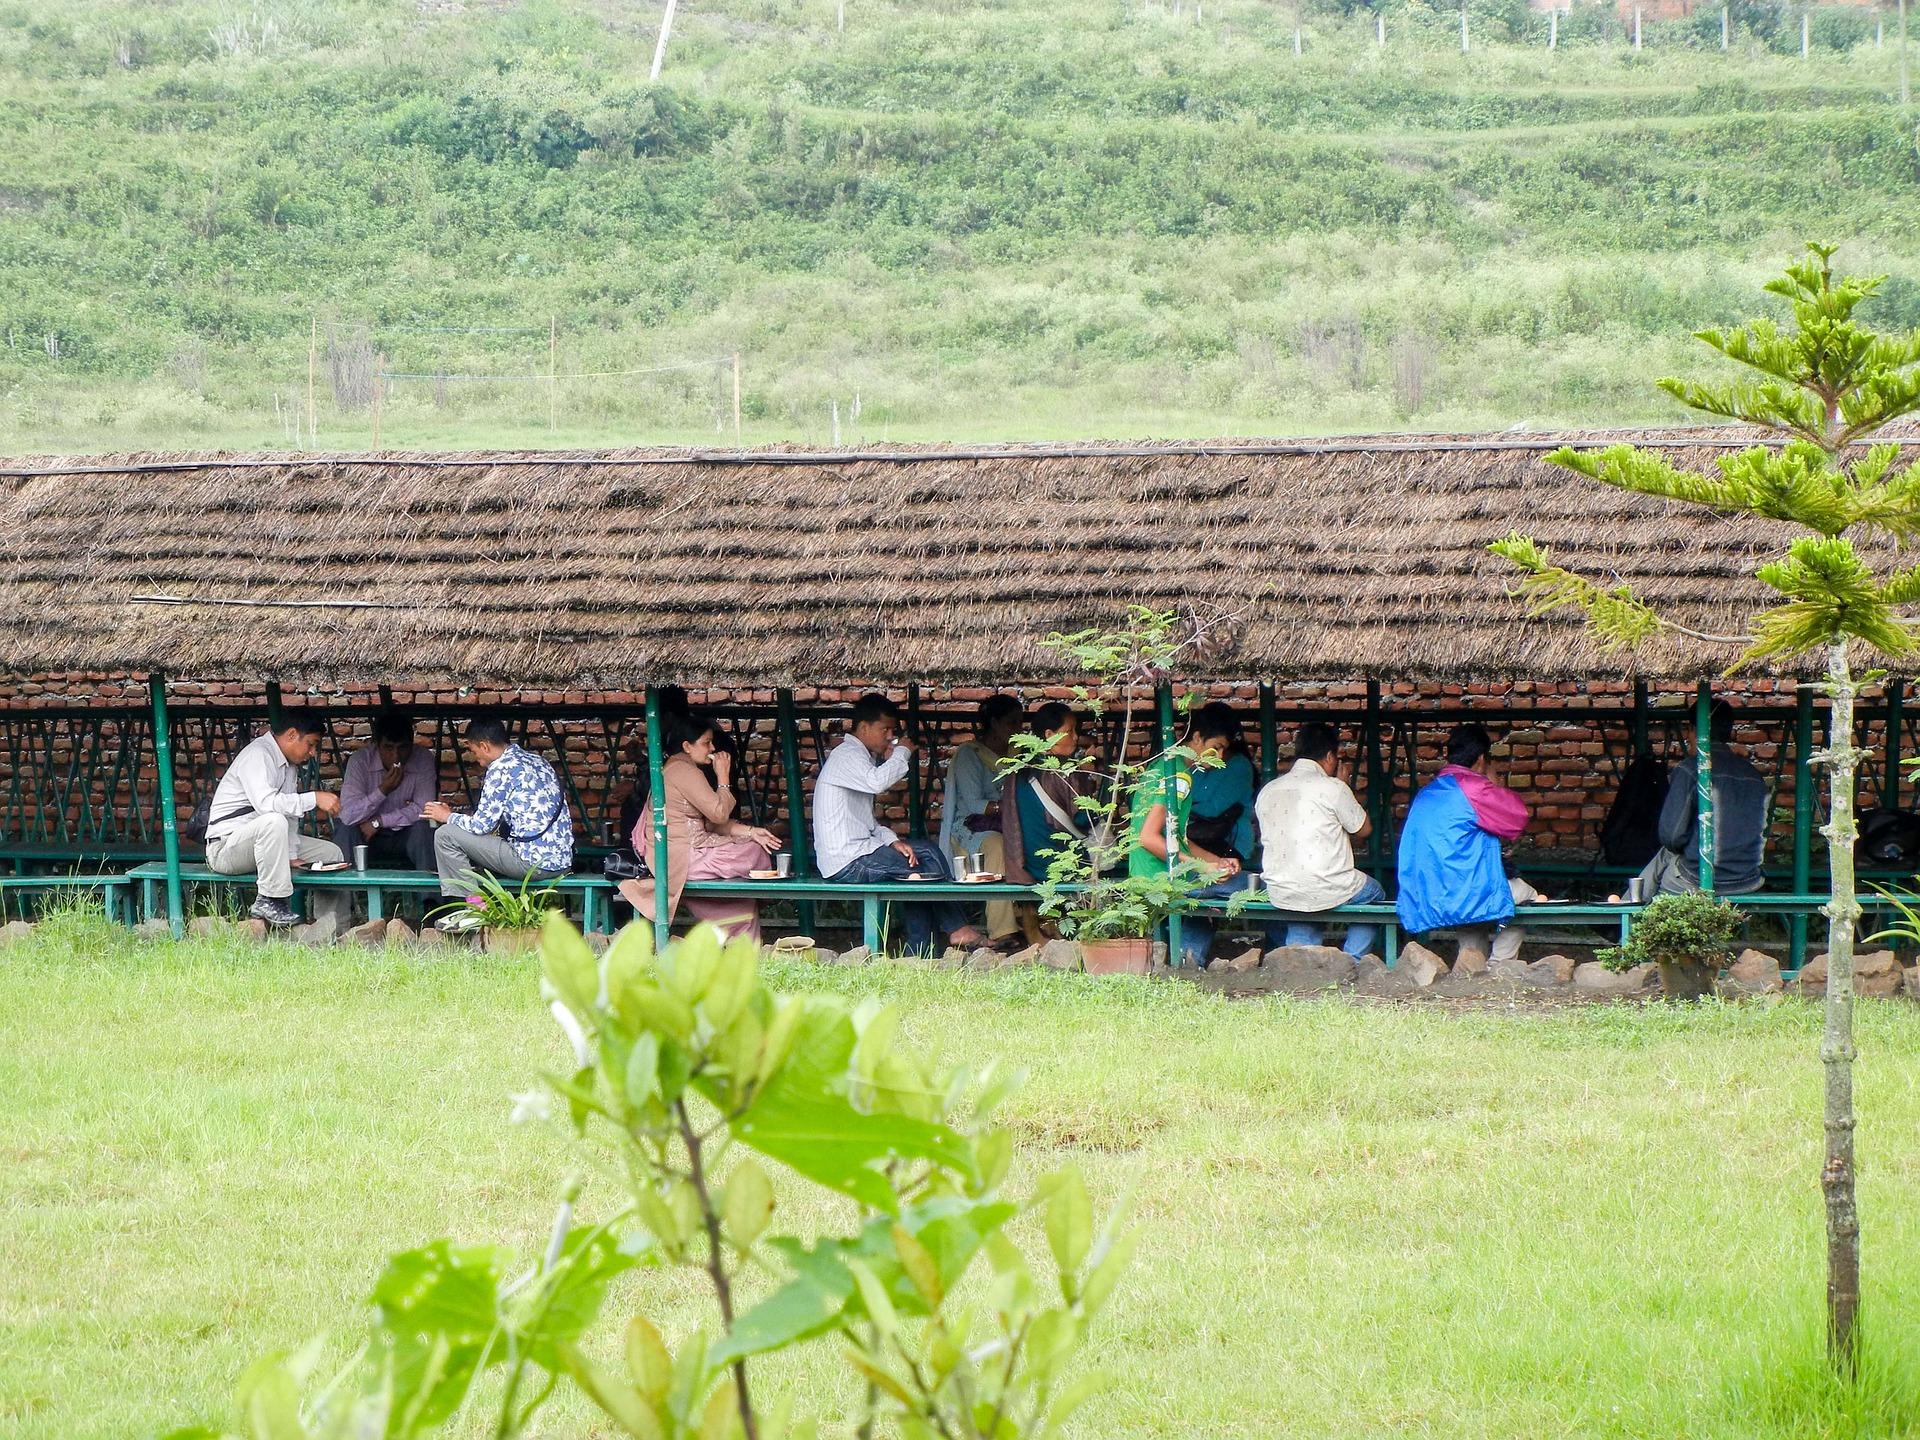 Volontariato internazionale in Nepal in ambito medico-sanitario